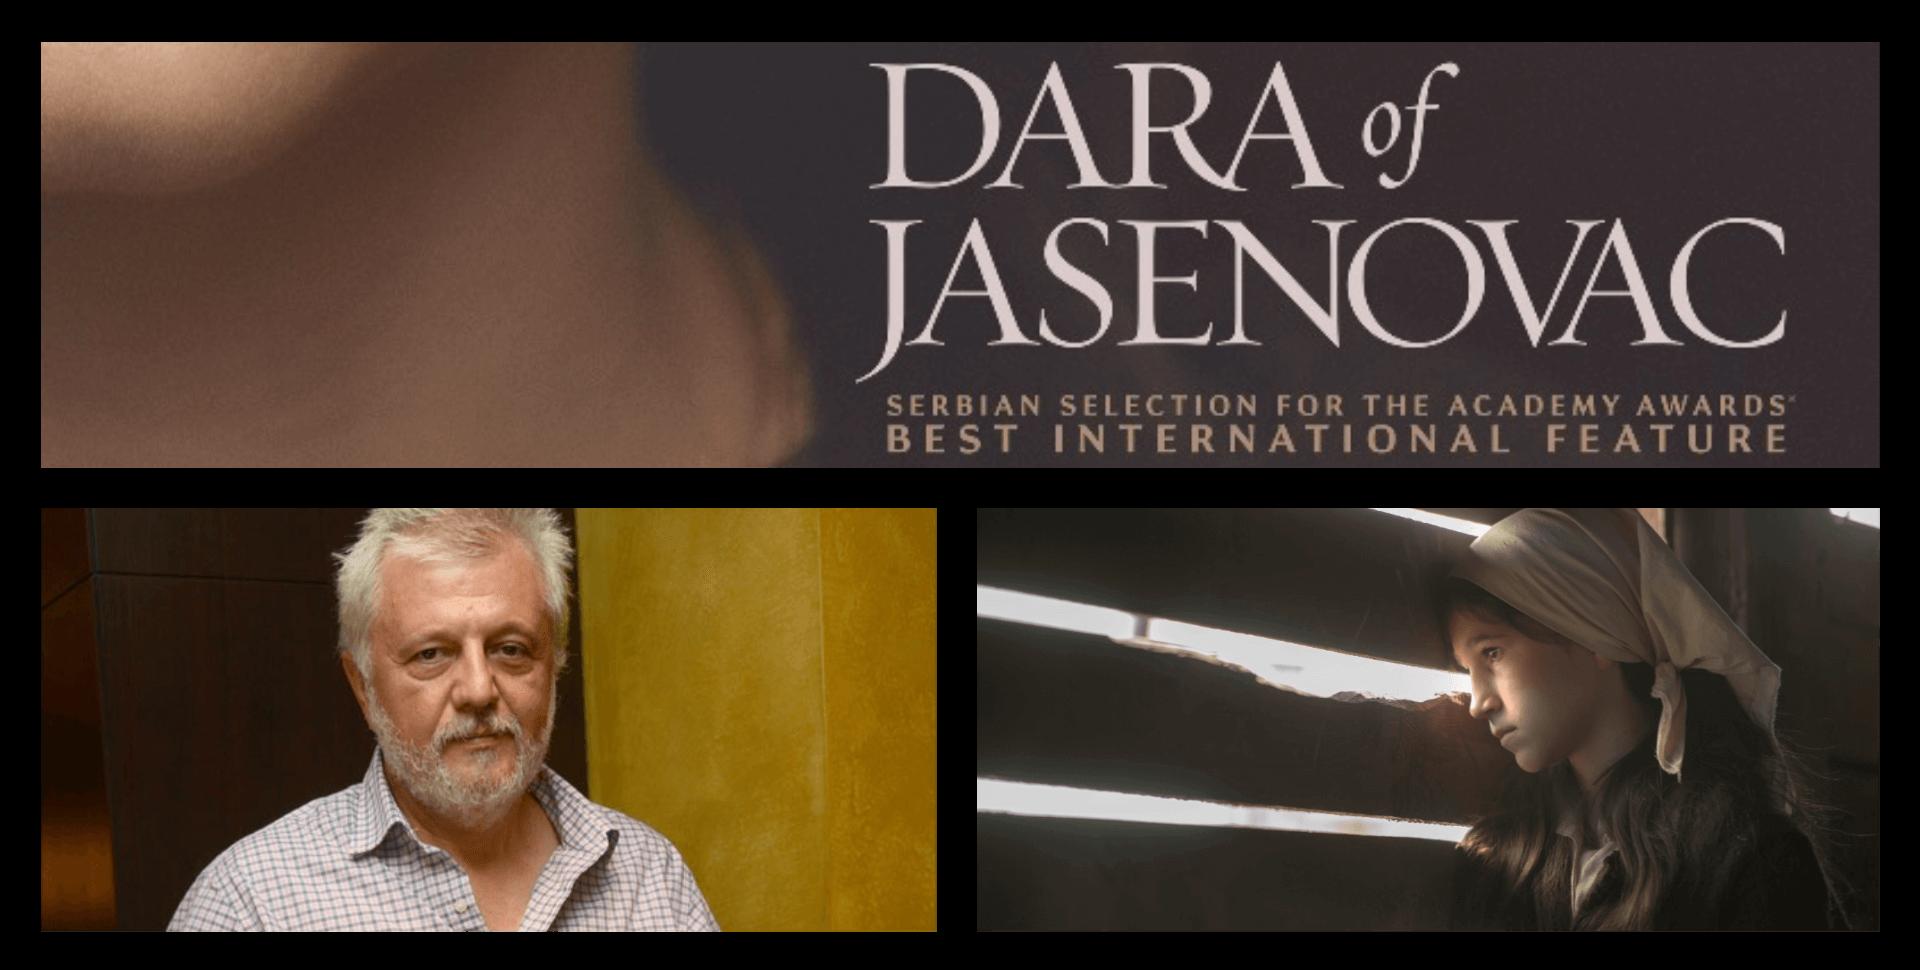 Interview with Film Director Predrag Antonijevic